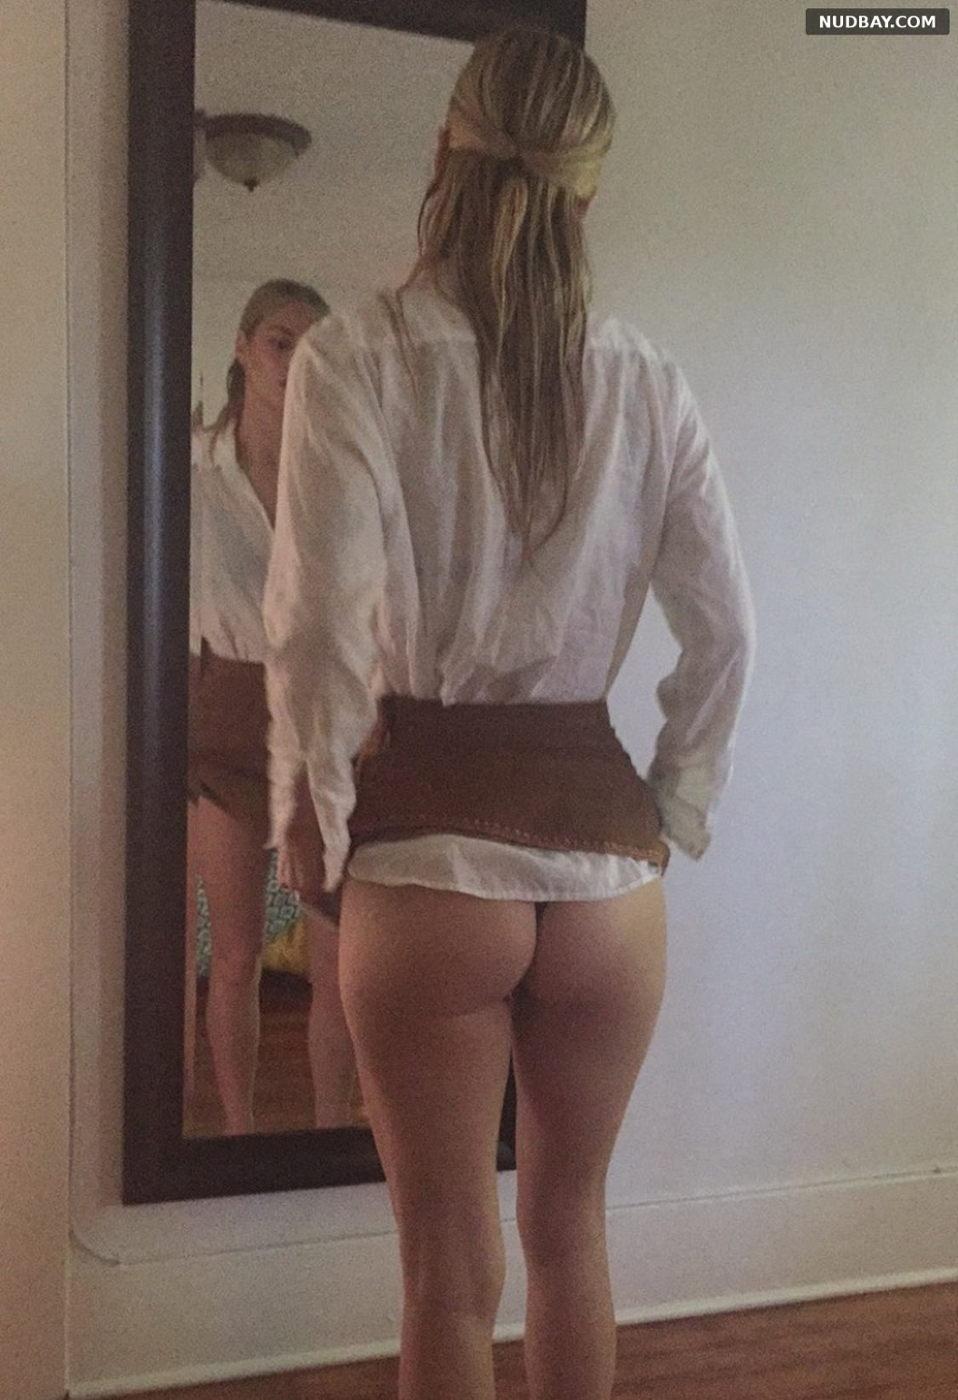 Samara Weaving nude nudbay.com 014